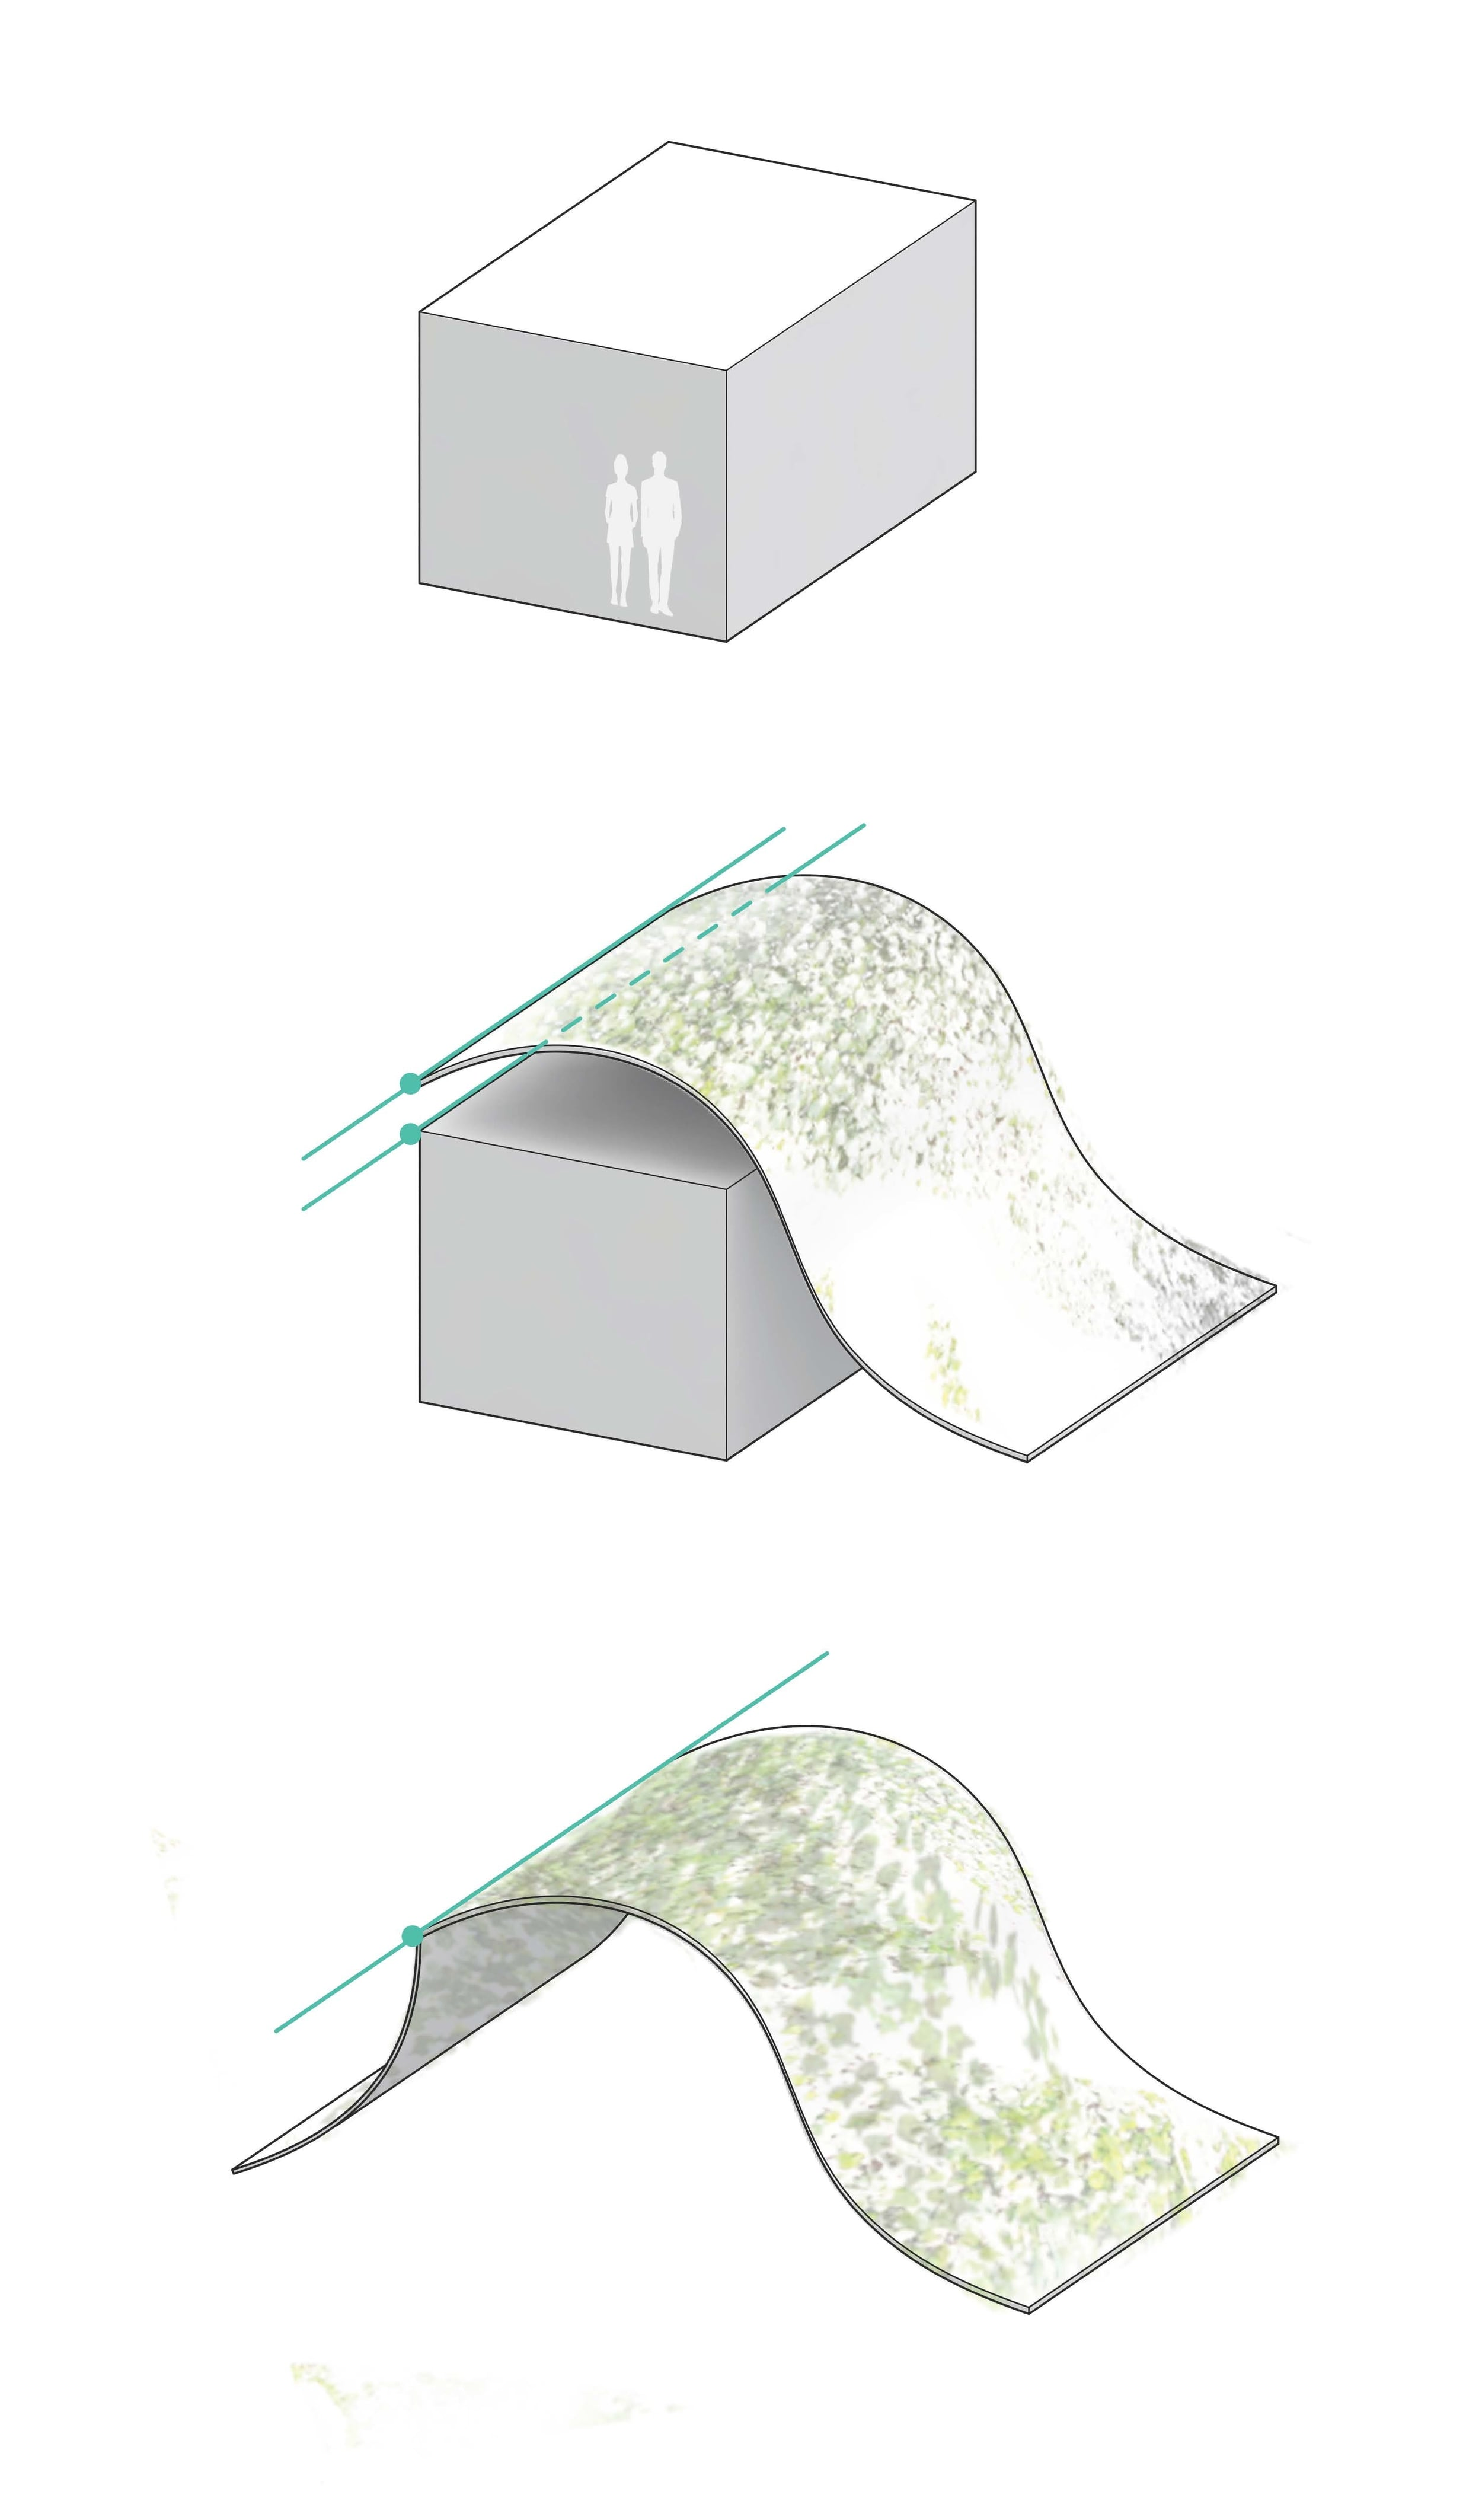 box and blanket diagram.jpg